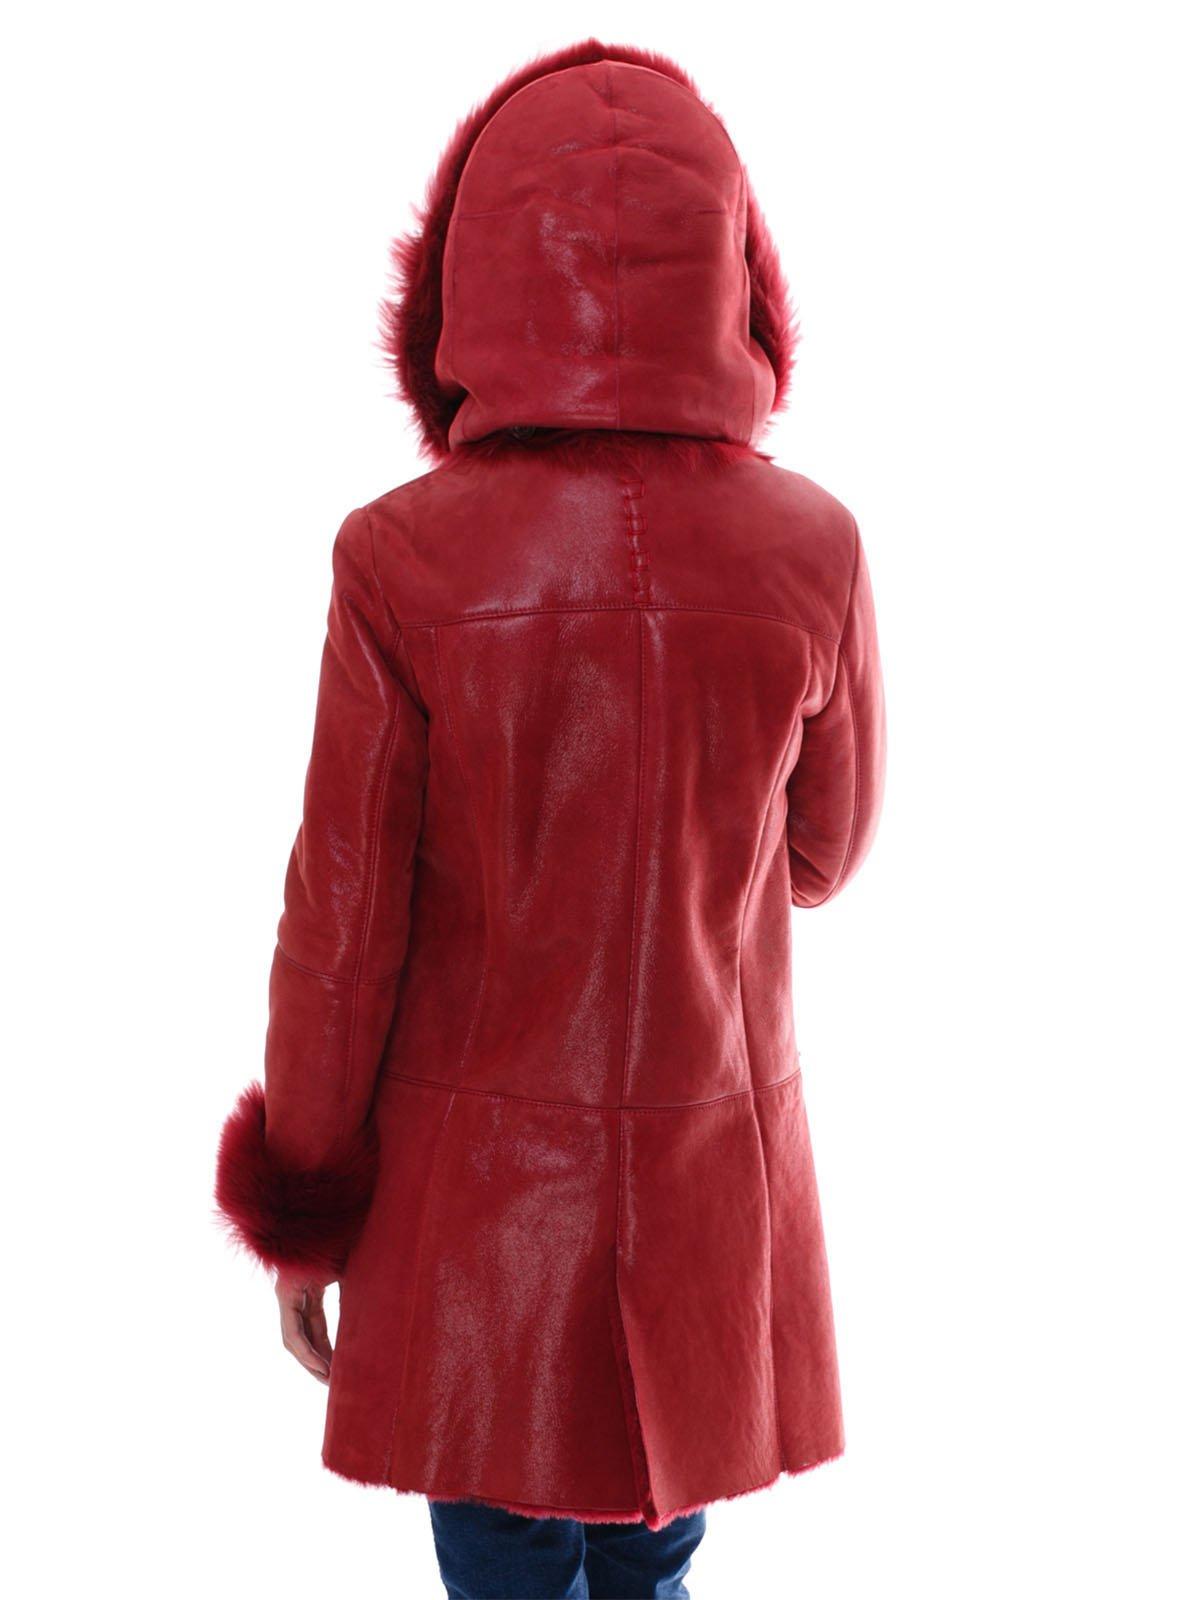 Дубленка красная | 2047136 | фото 4